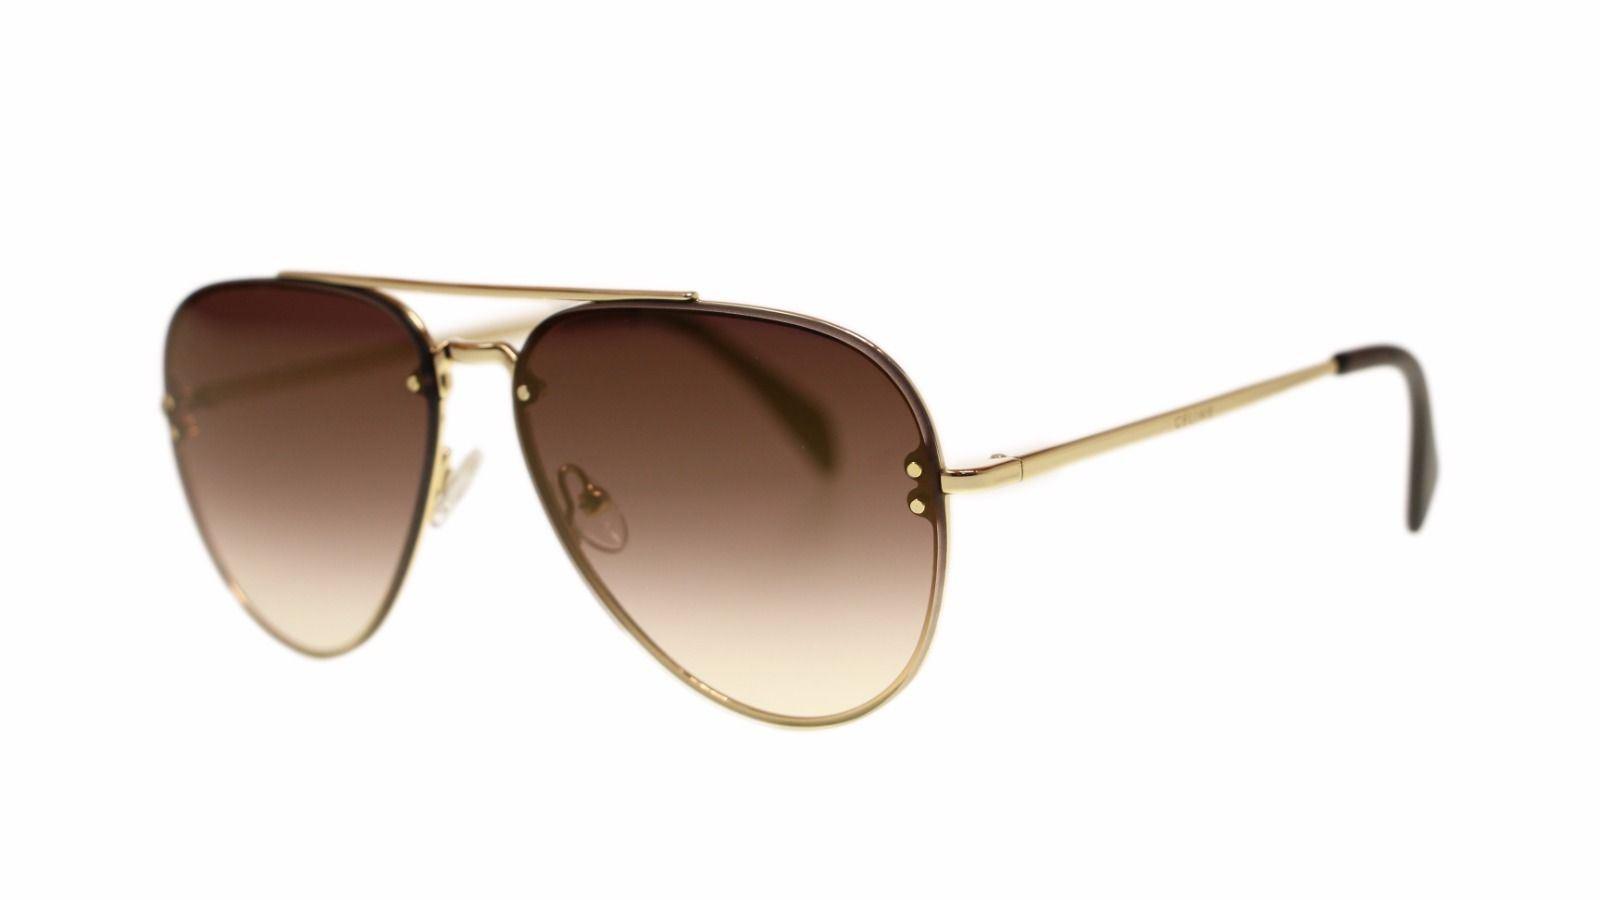 86448e7fd3a Celine Unisex Sunglasses Cl41392 J5G QH and 50 similar items